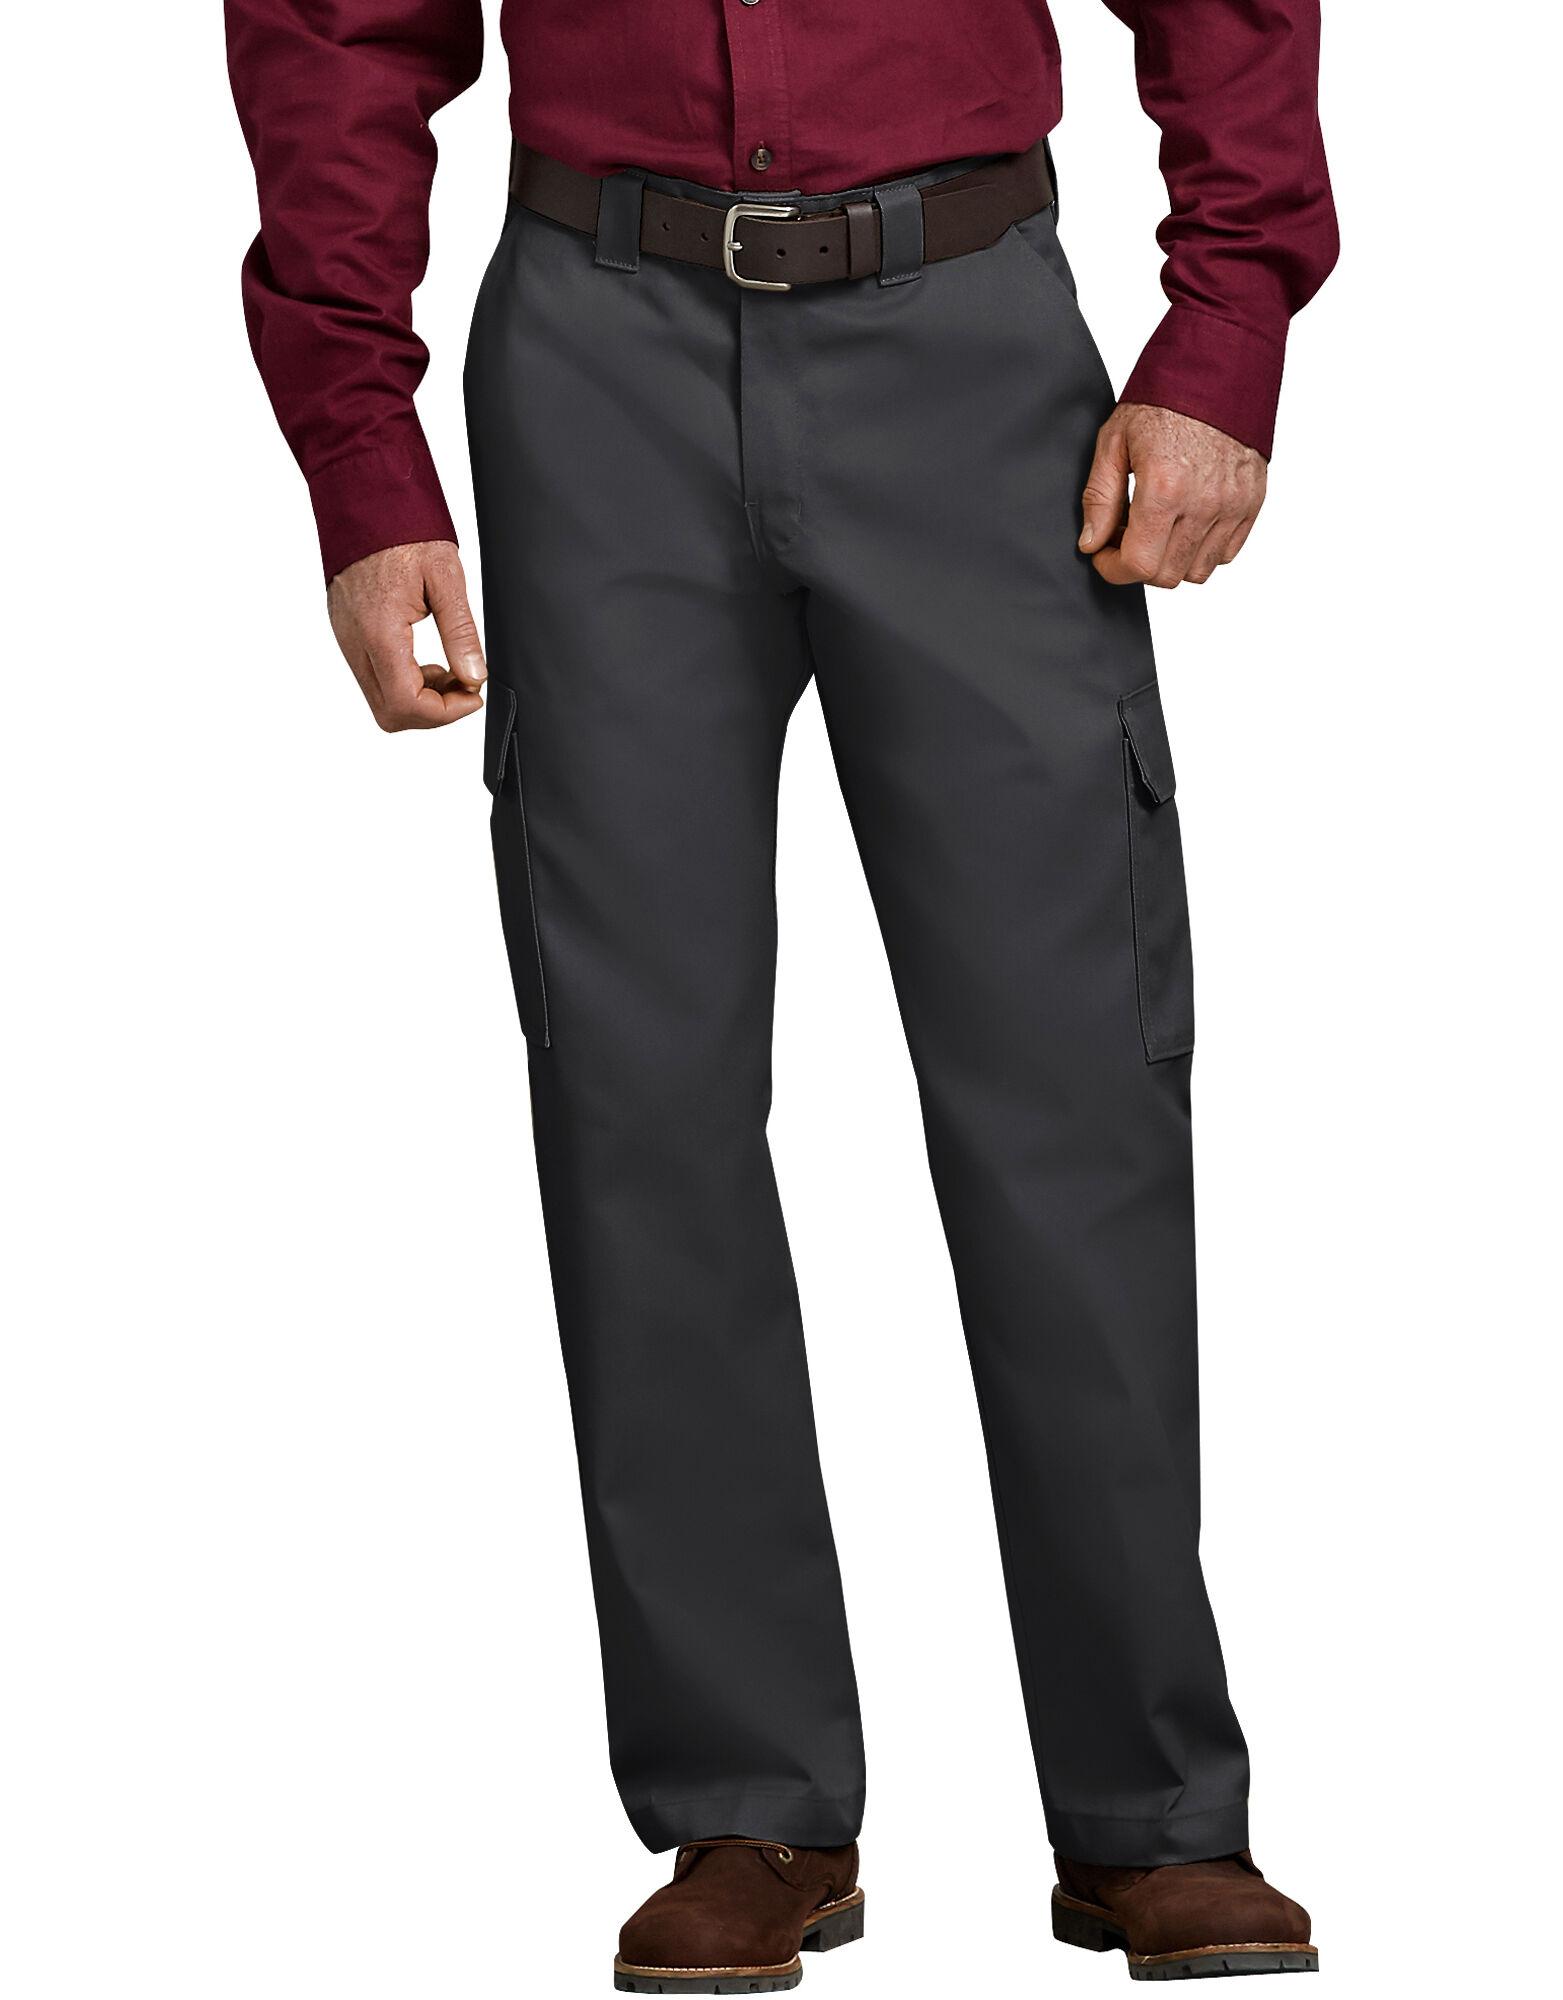 mens work jeans